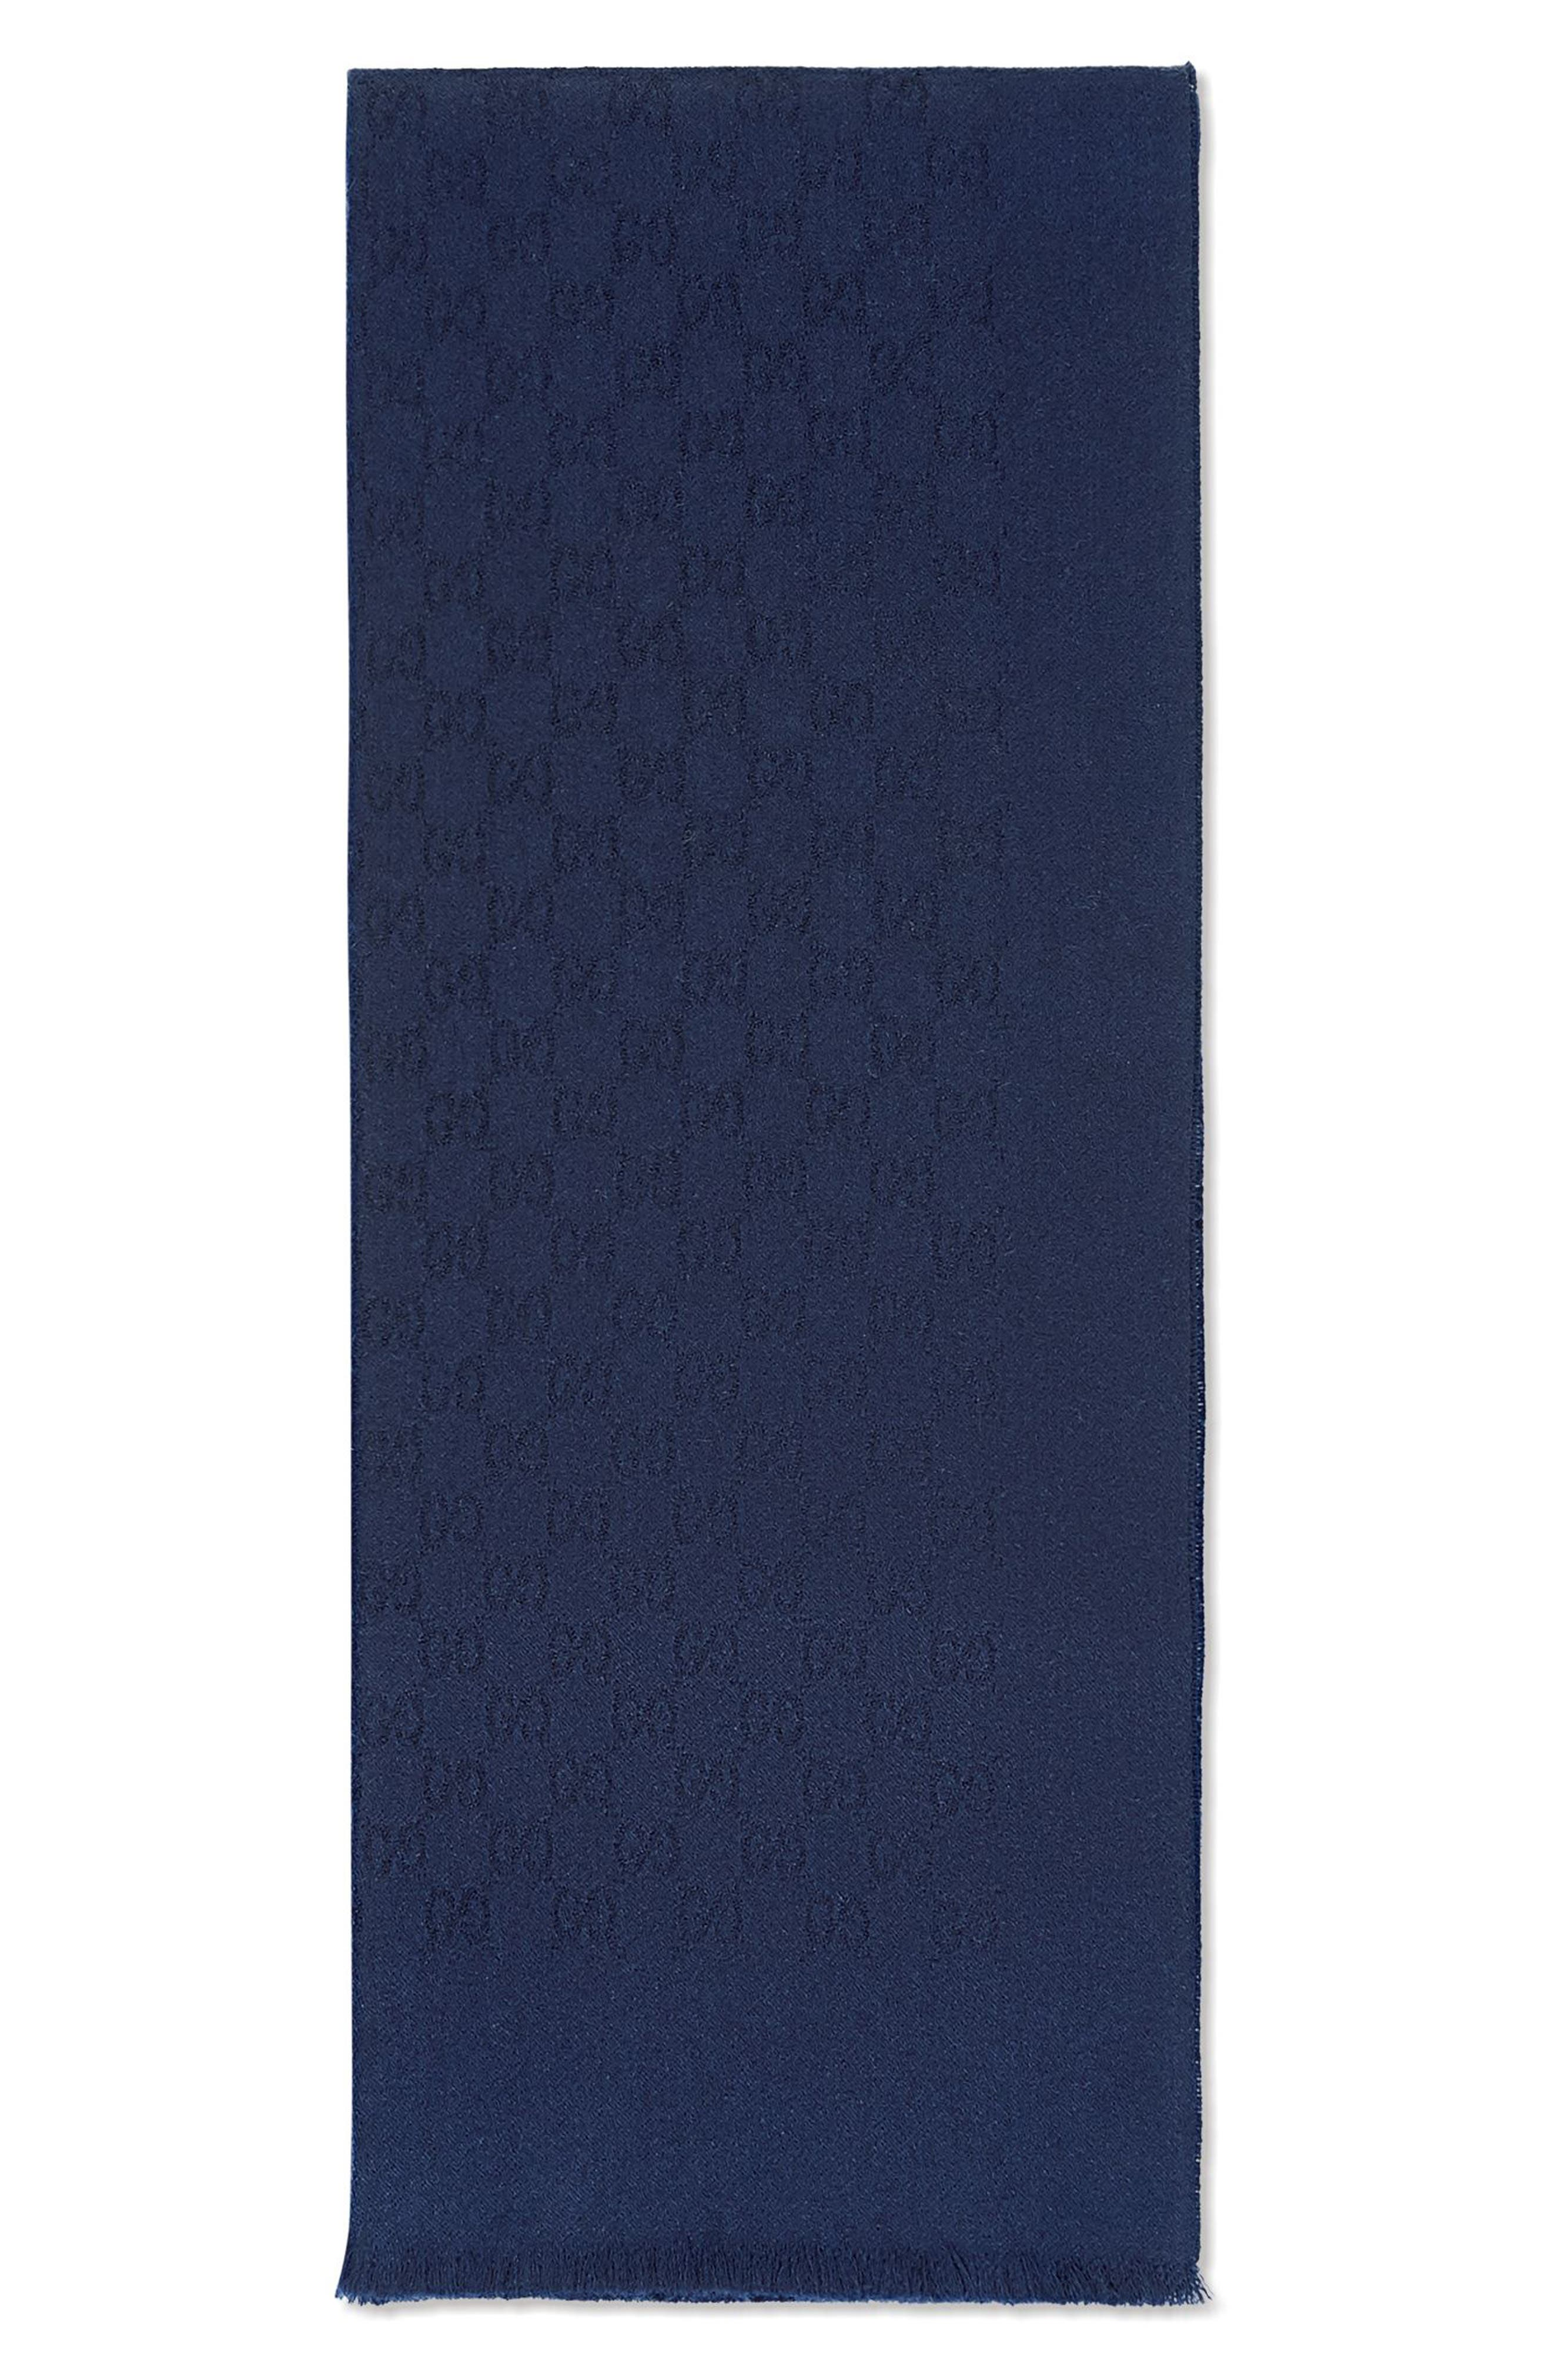 GG Gem Lux Jacquard Cashmere Scarf,                             Main thumbnail 1, color,                             4000 Midnight Blue